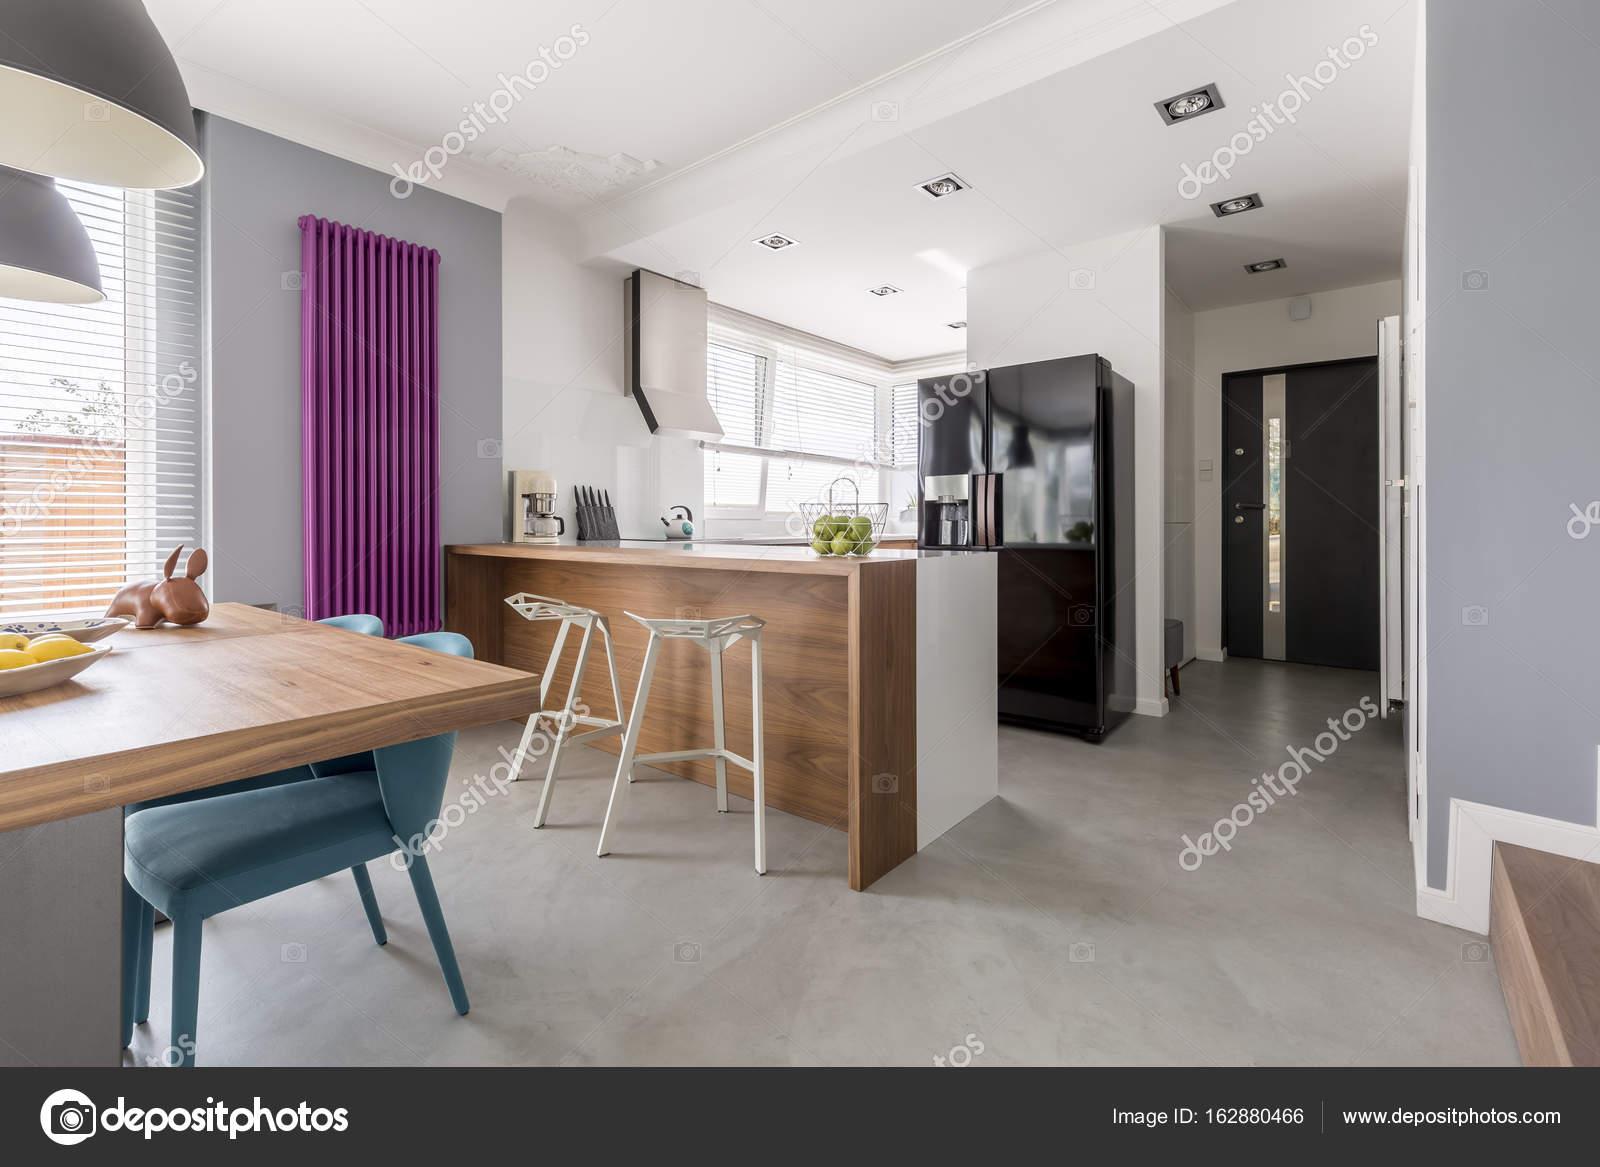 Eetkamer keuken en ingang u2014 stockfoto © photographee.eu #162880466